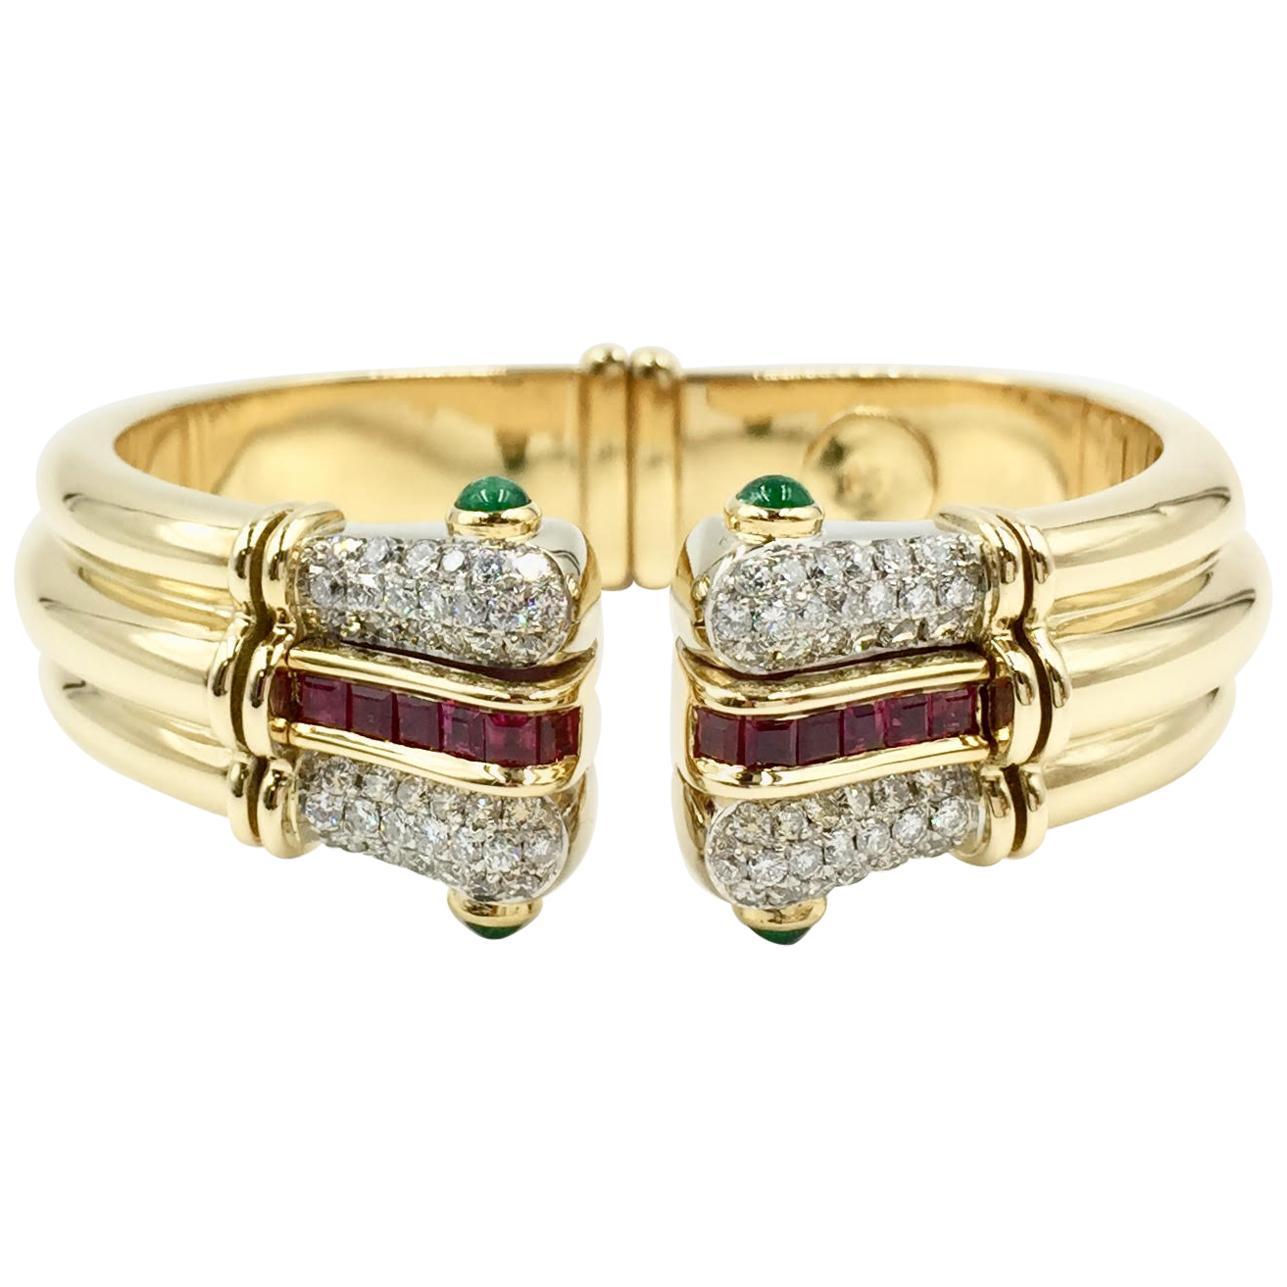 Diamond, Emerald and Ruby 18 Karat Wide Cuff Bracelet